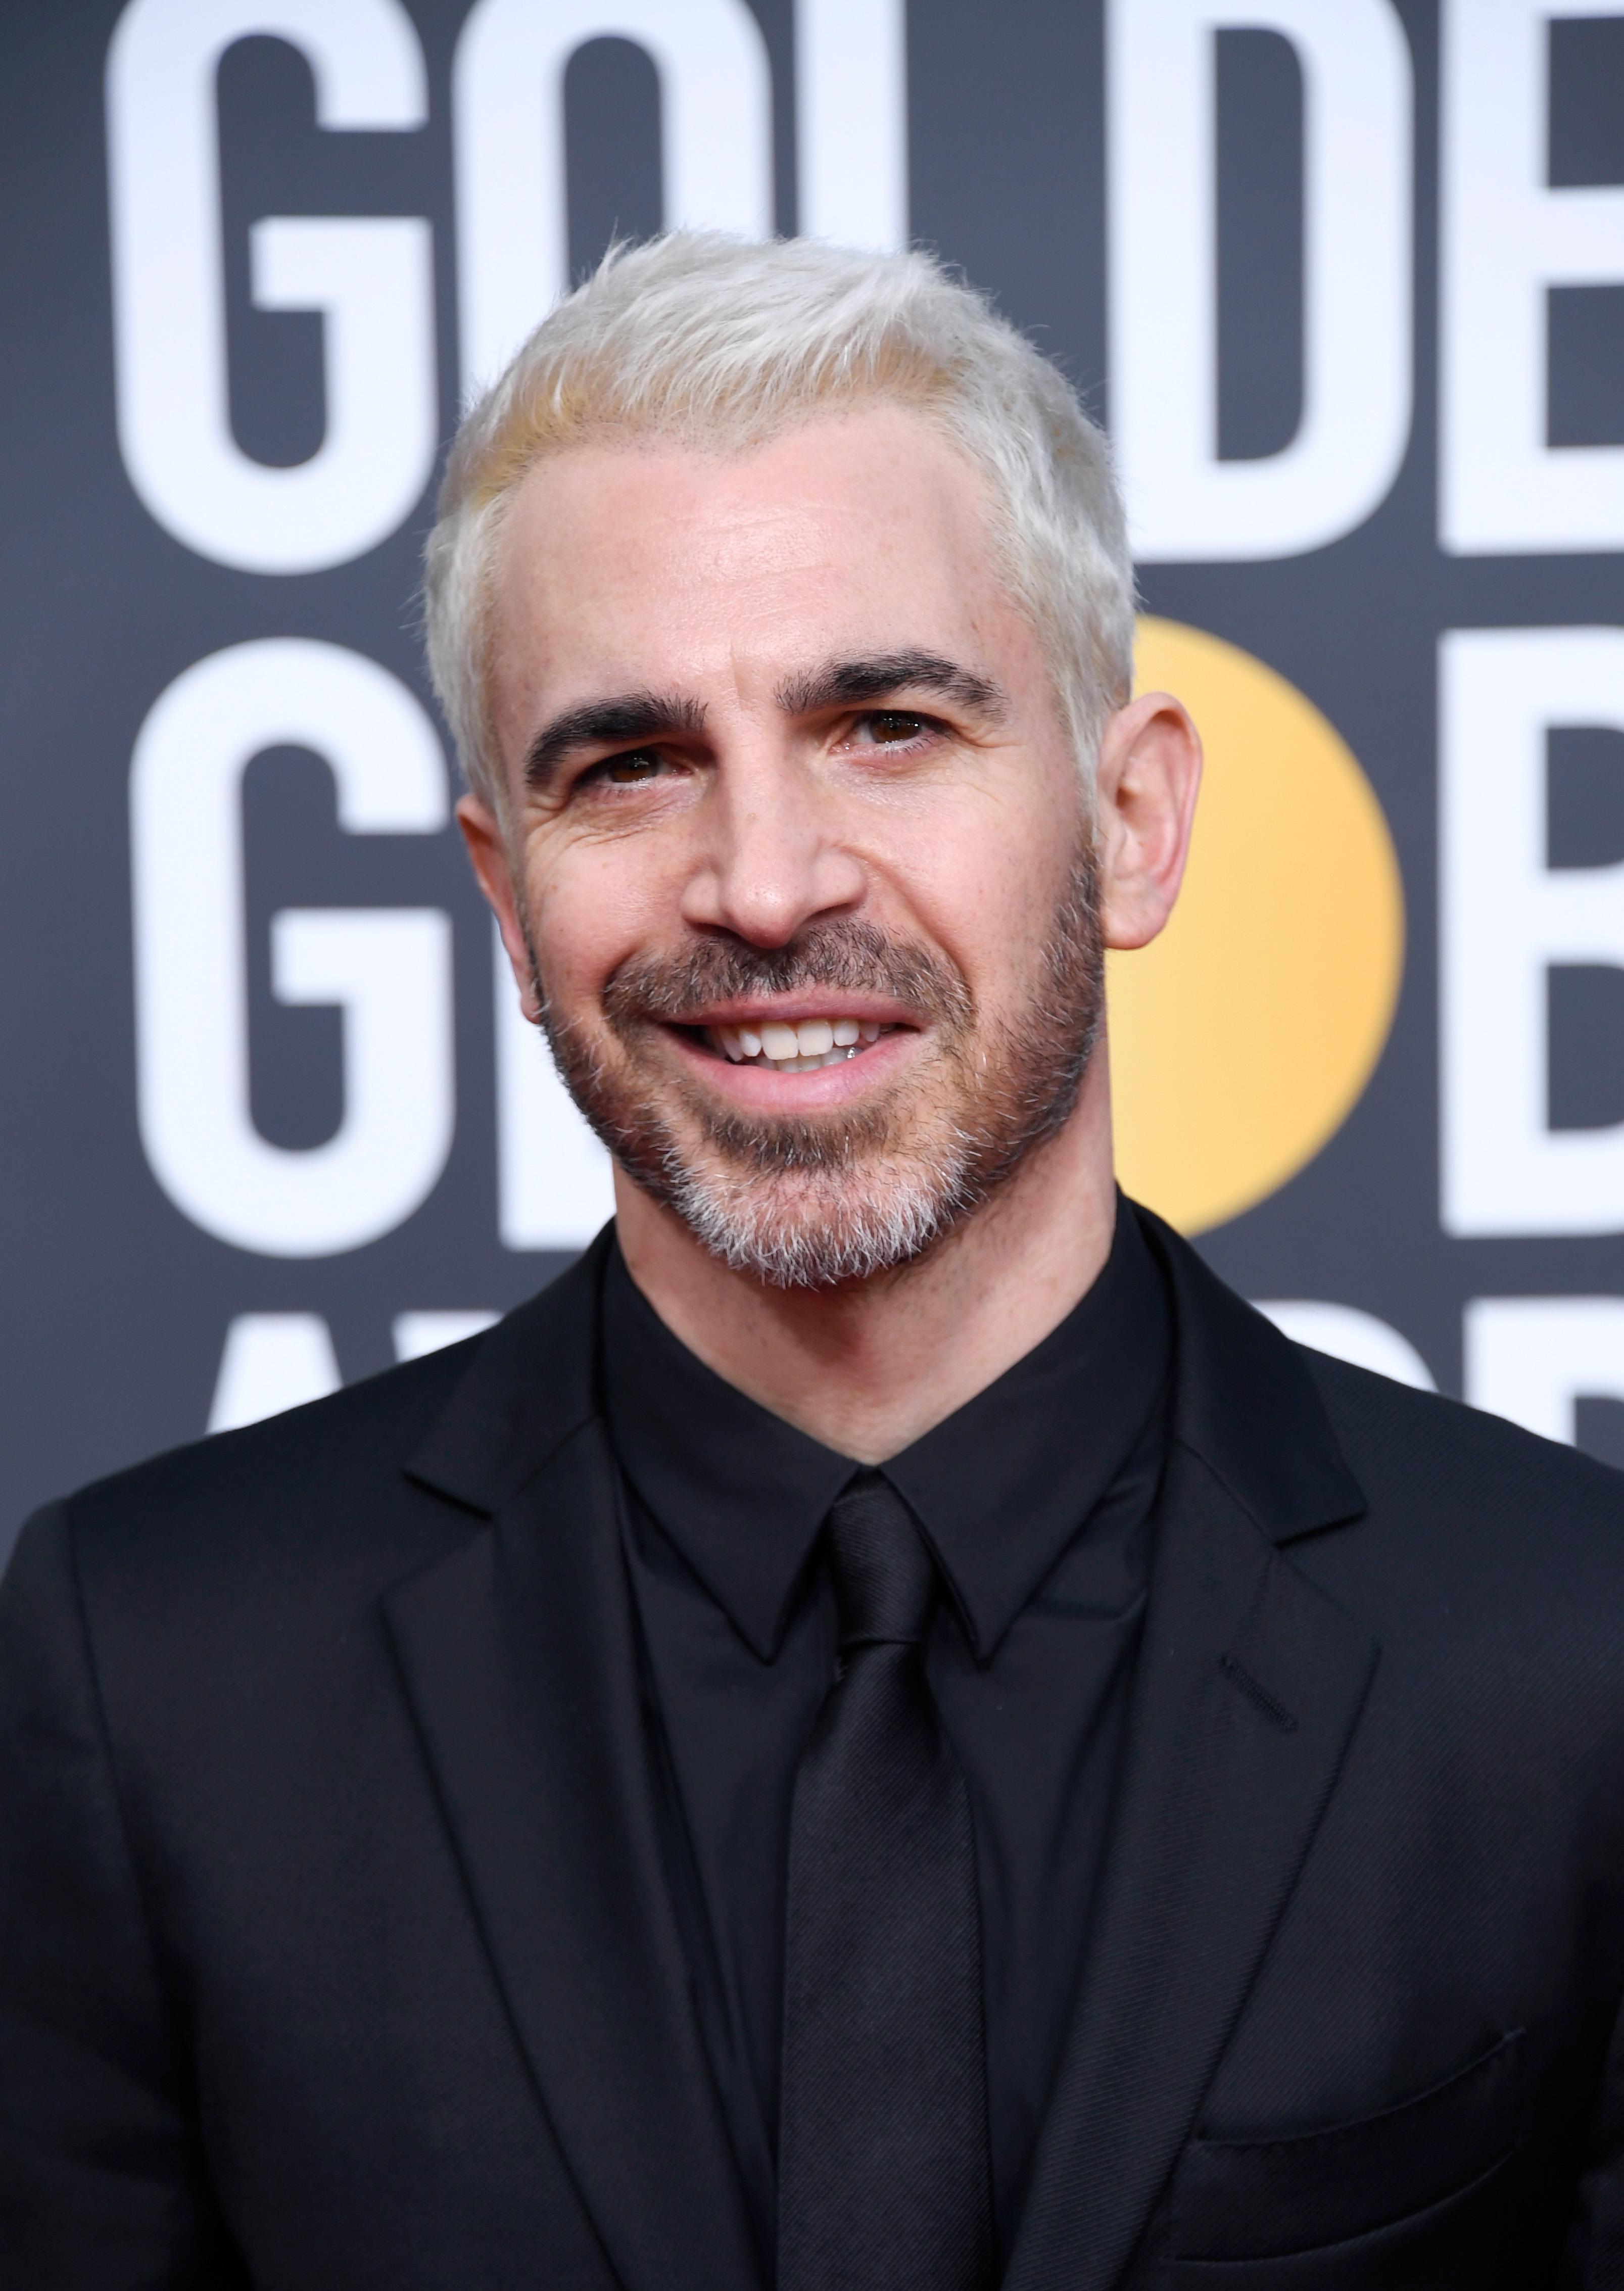 Chris Messina at the 2019 Golden Globes